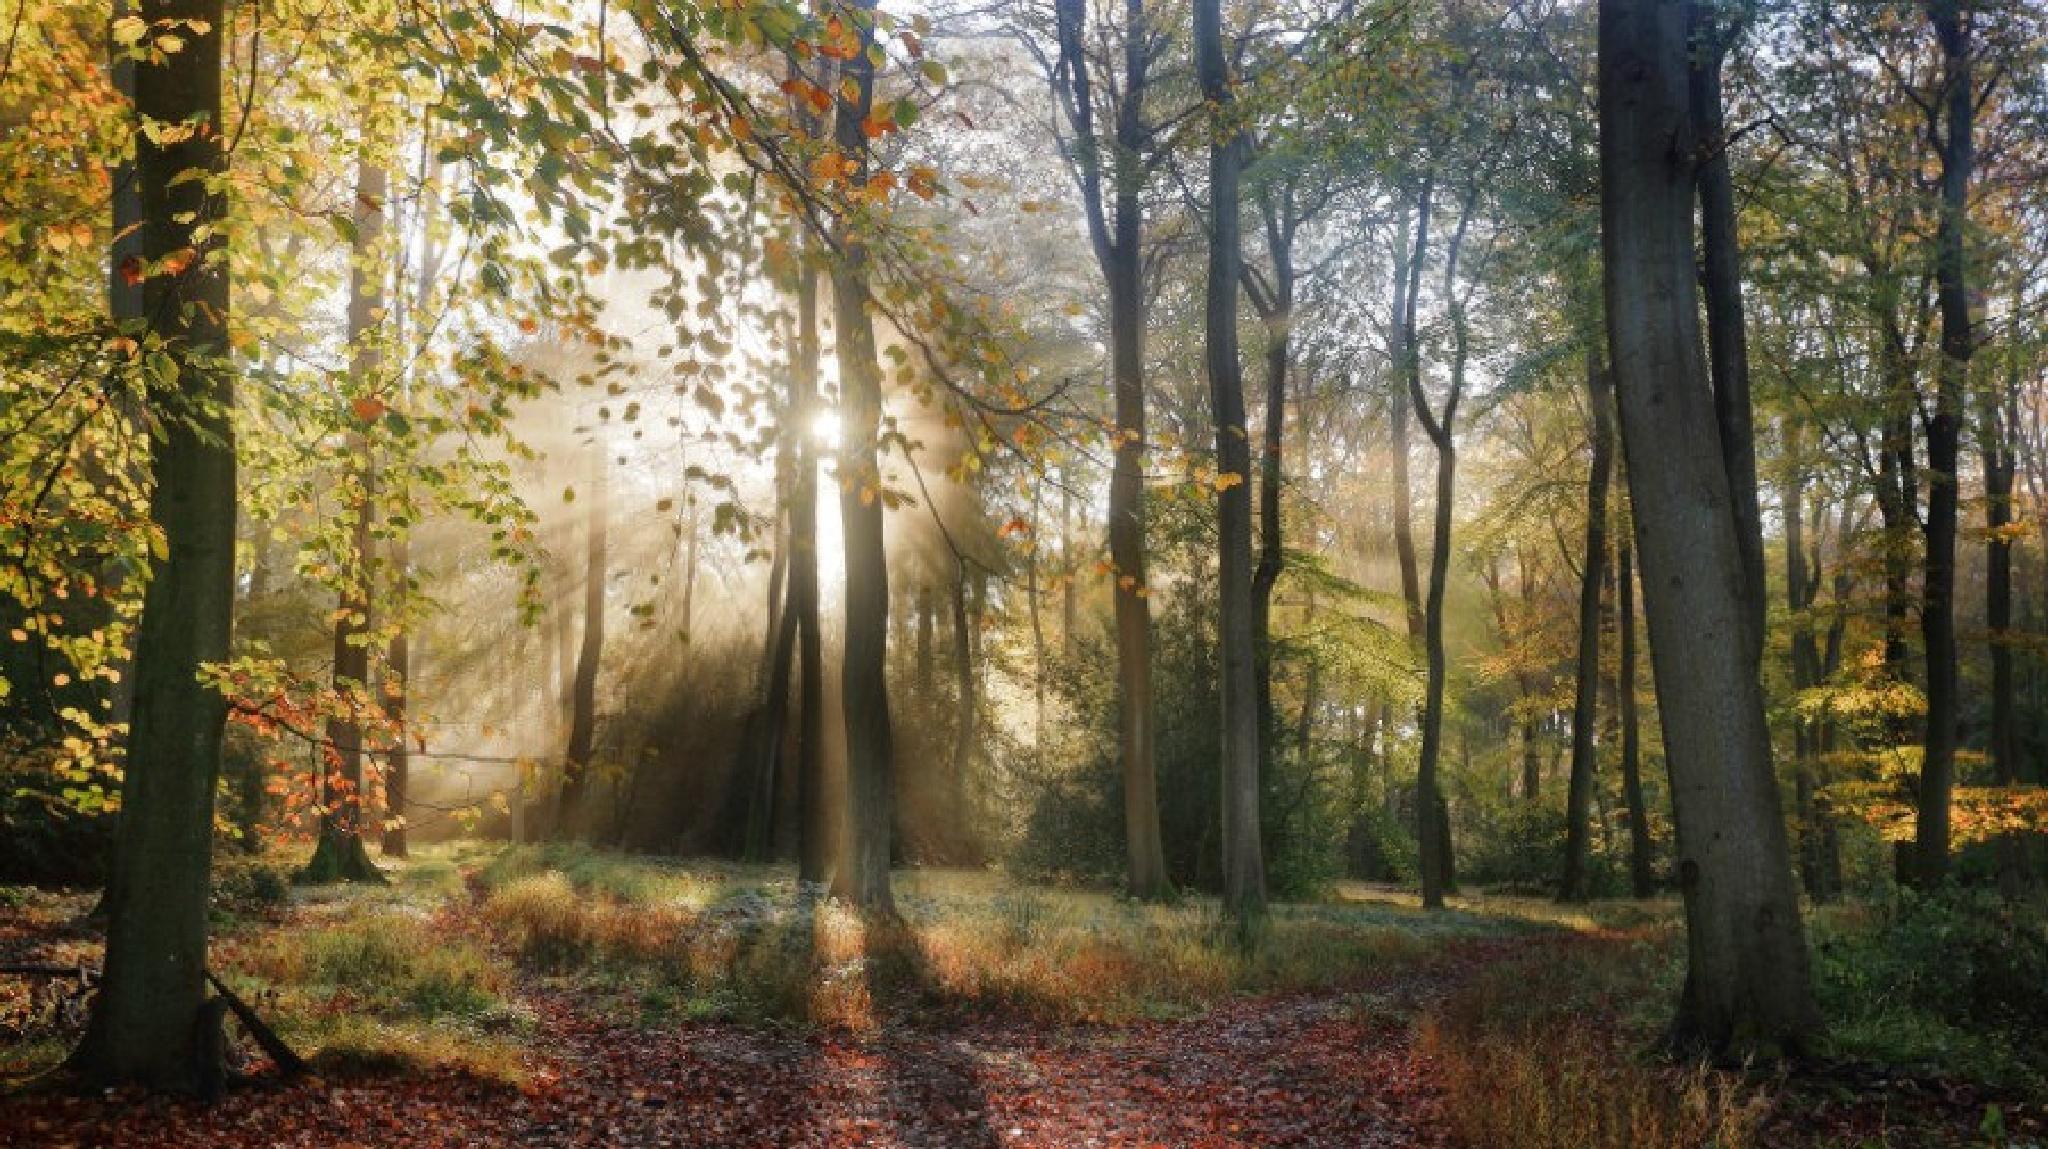 Autumn Morning Woods by cerijones14019